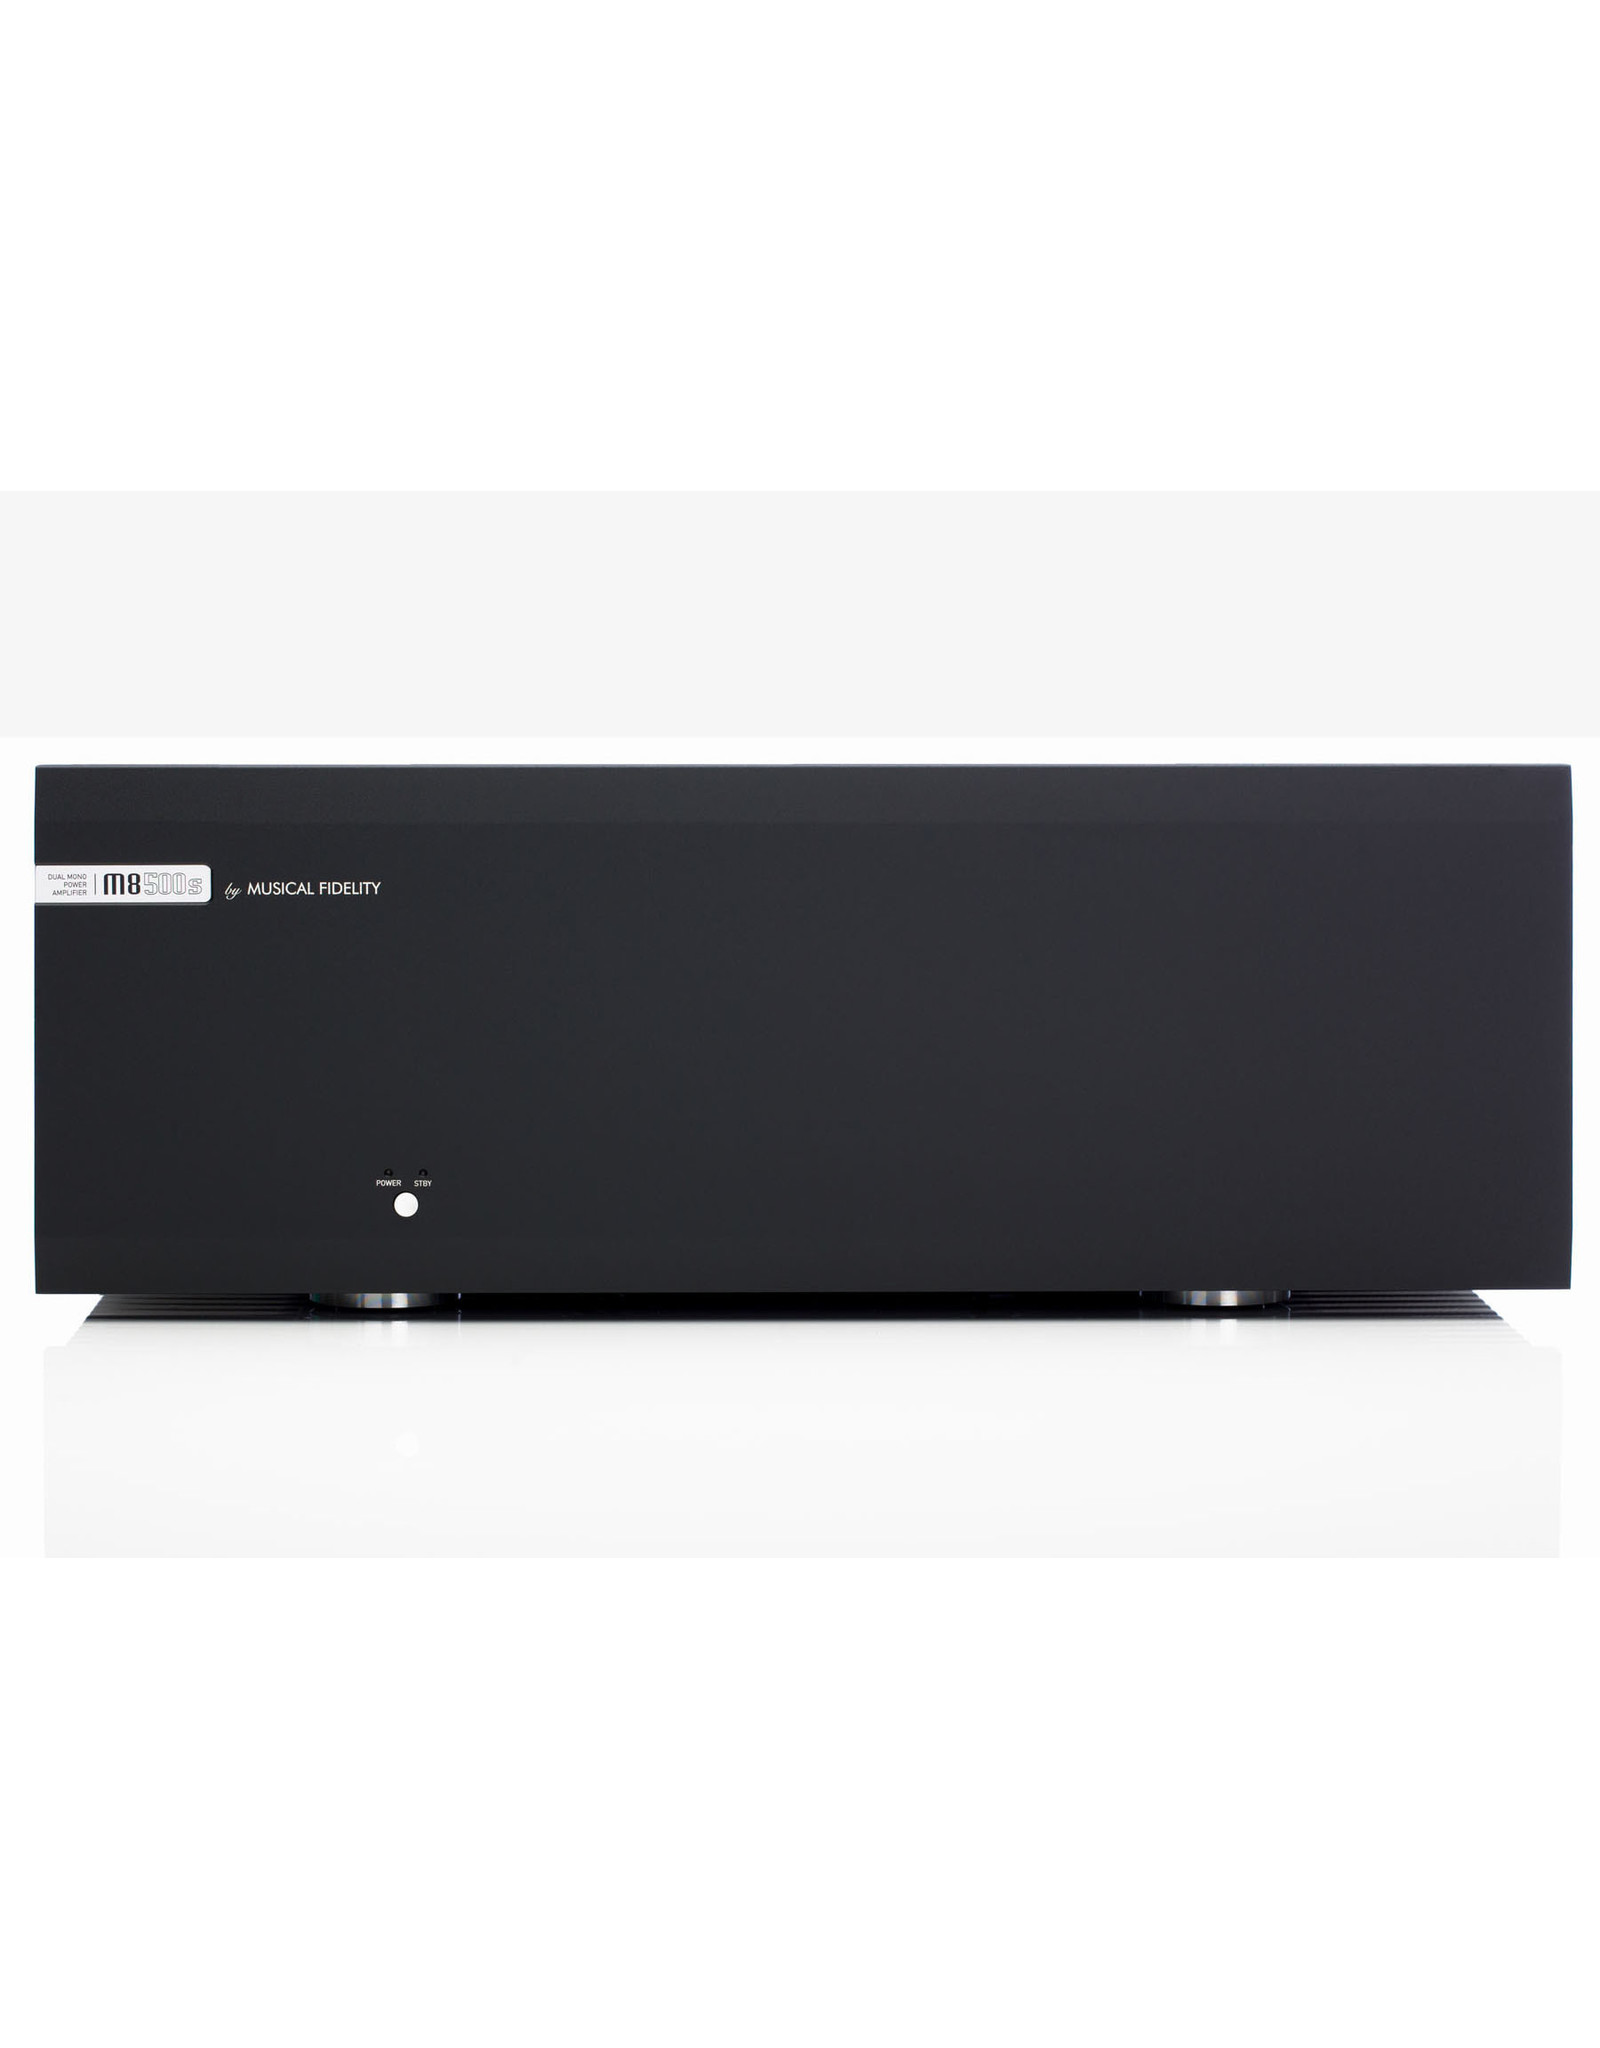 Musical Fidelity Musical Fidelity M8s-500s Power Amplifier